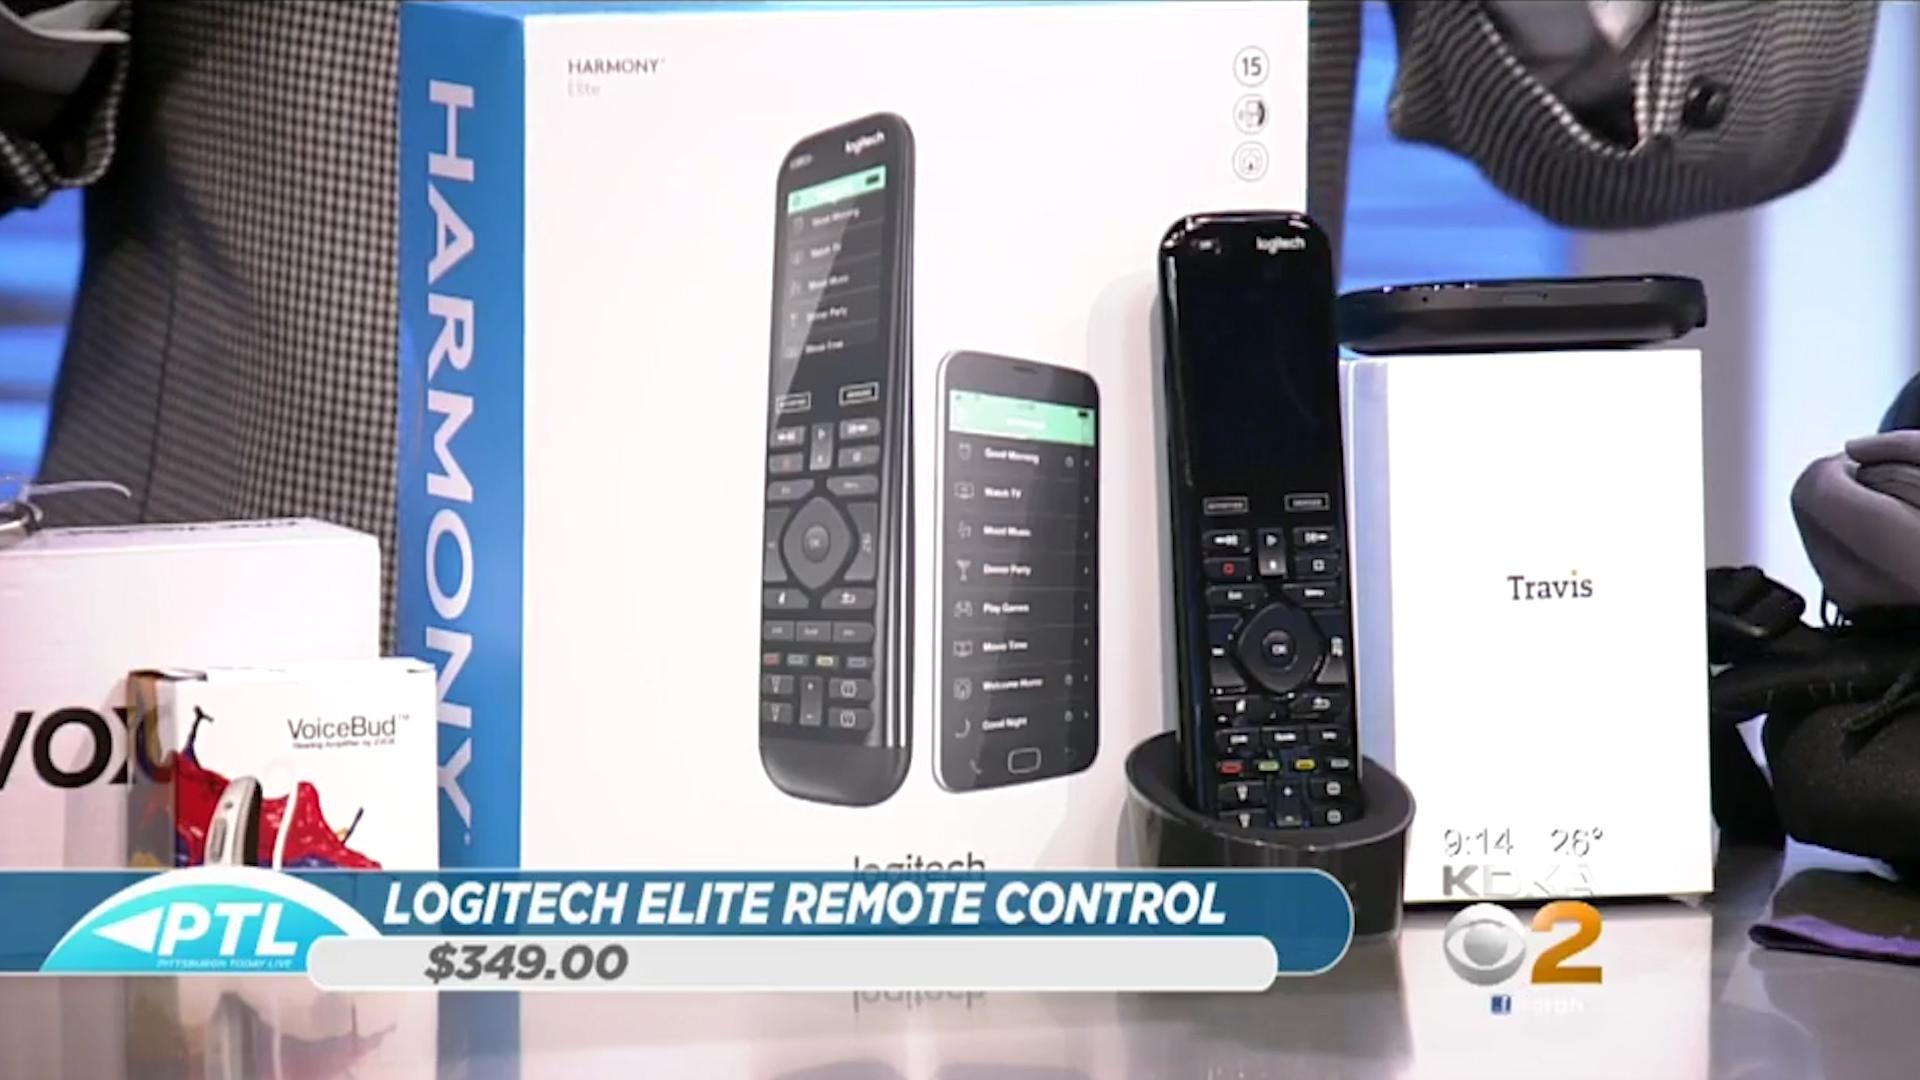 HARMONY ELITE REMOTE CONTROL by LOGITECH - $349.00Shop Now